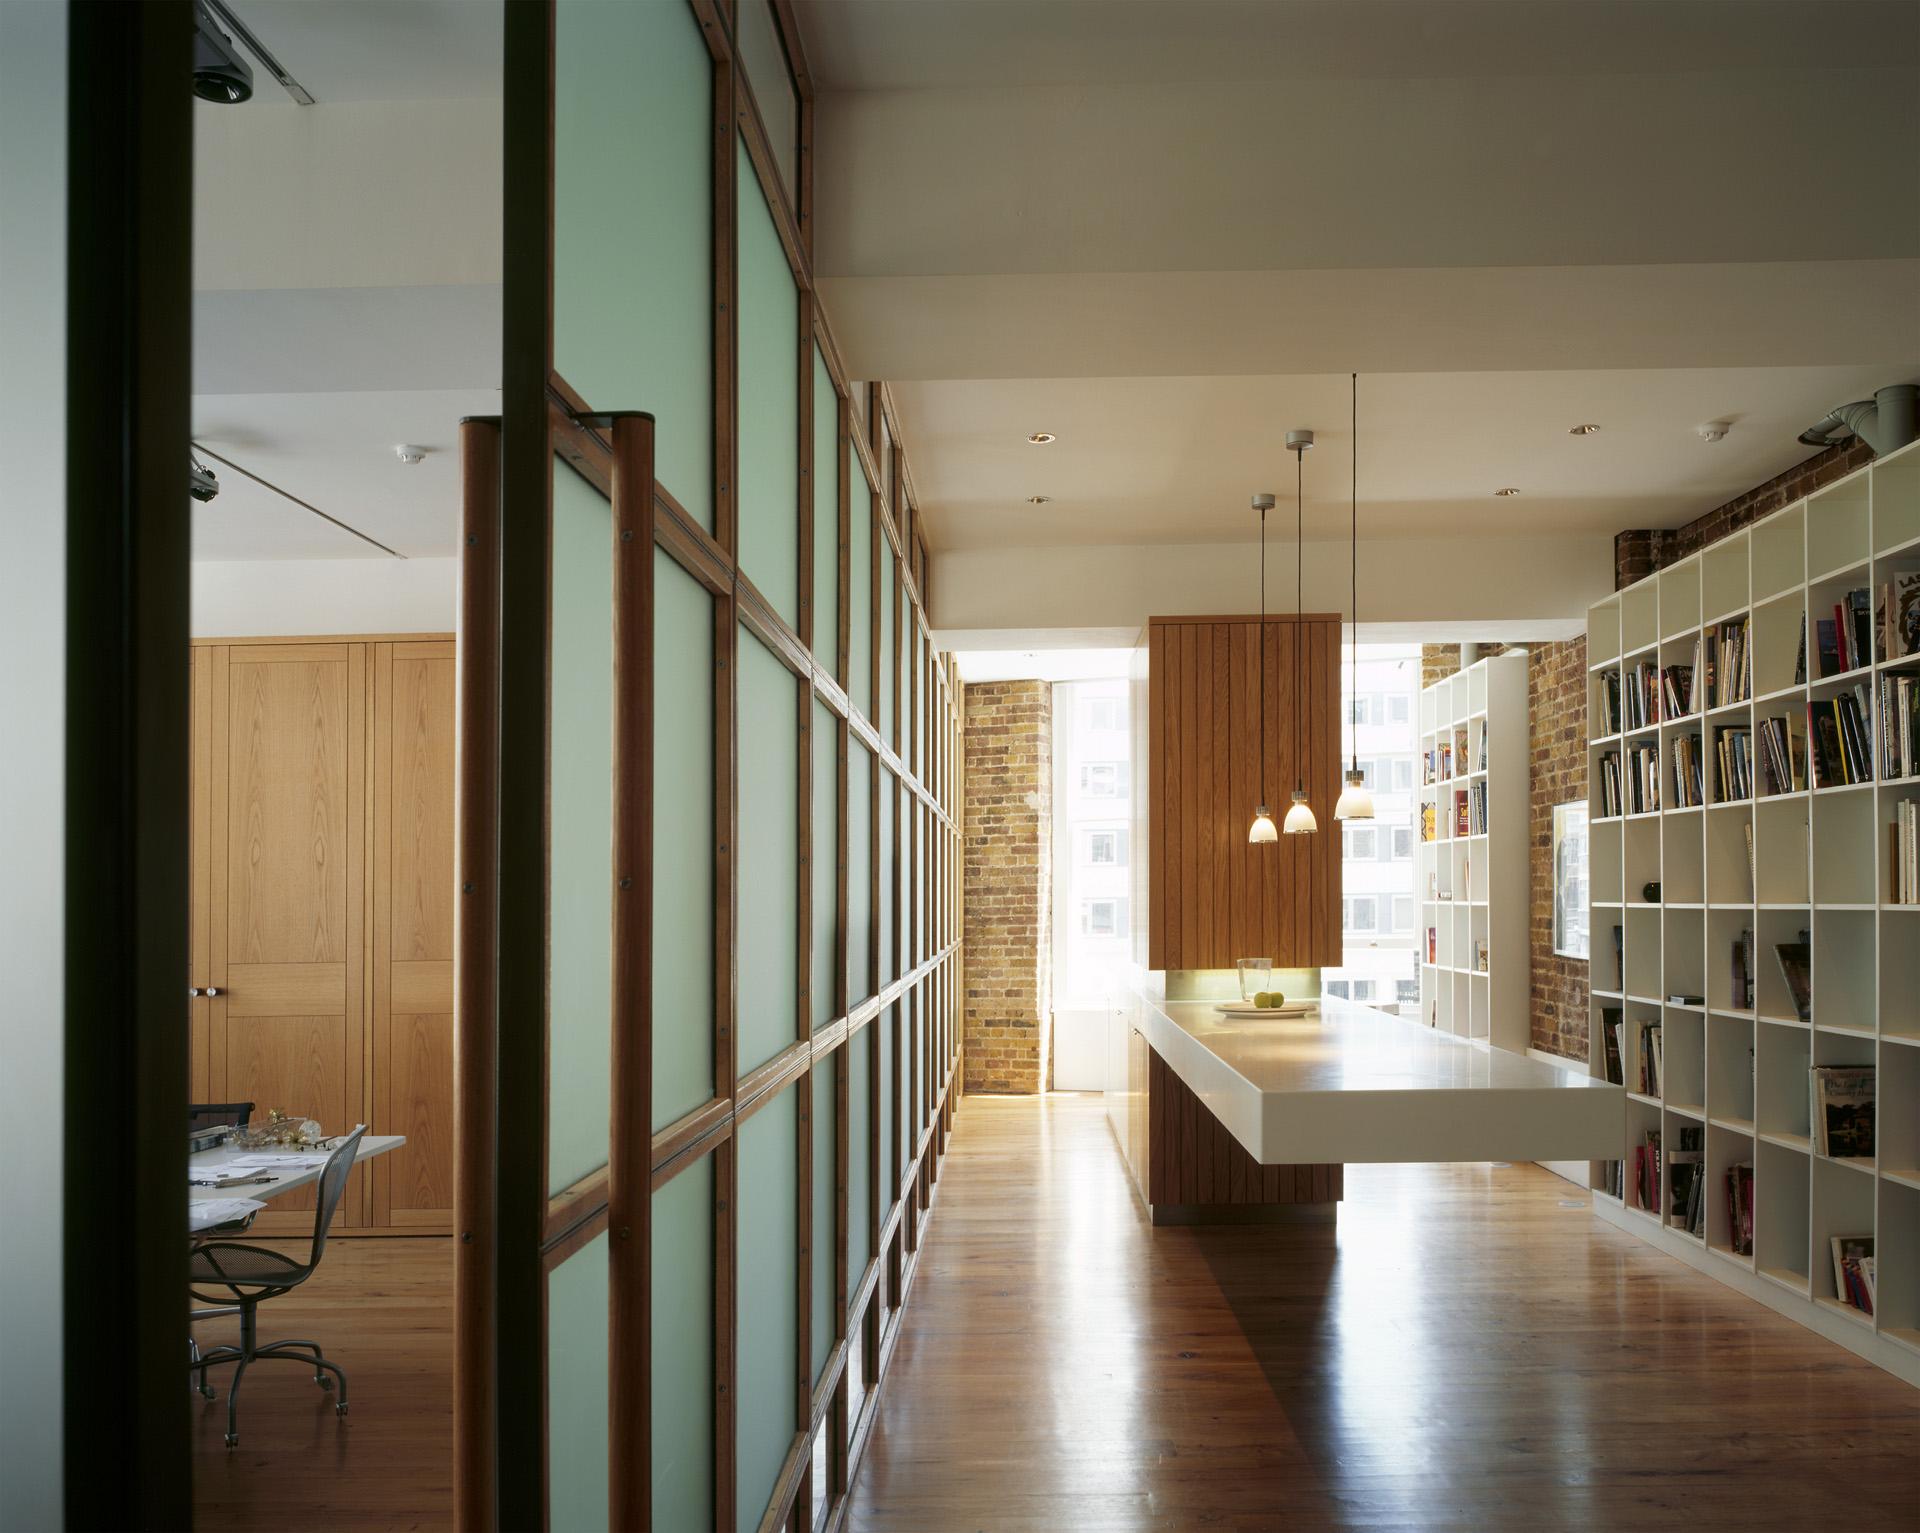 tabernacle-street-interior-05